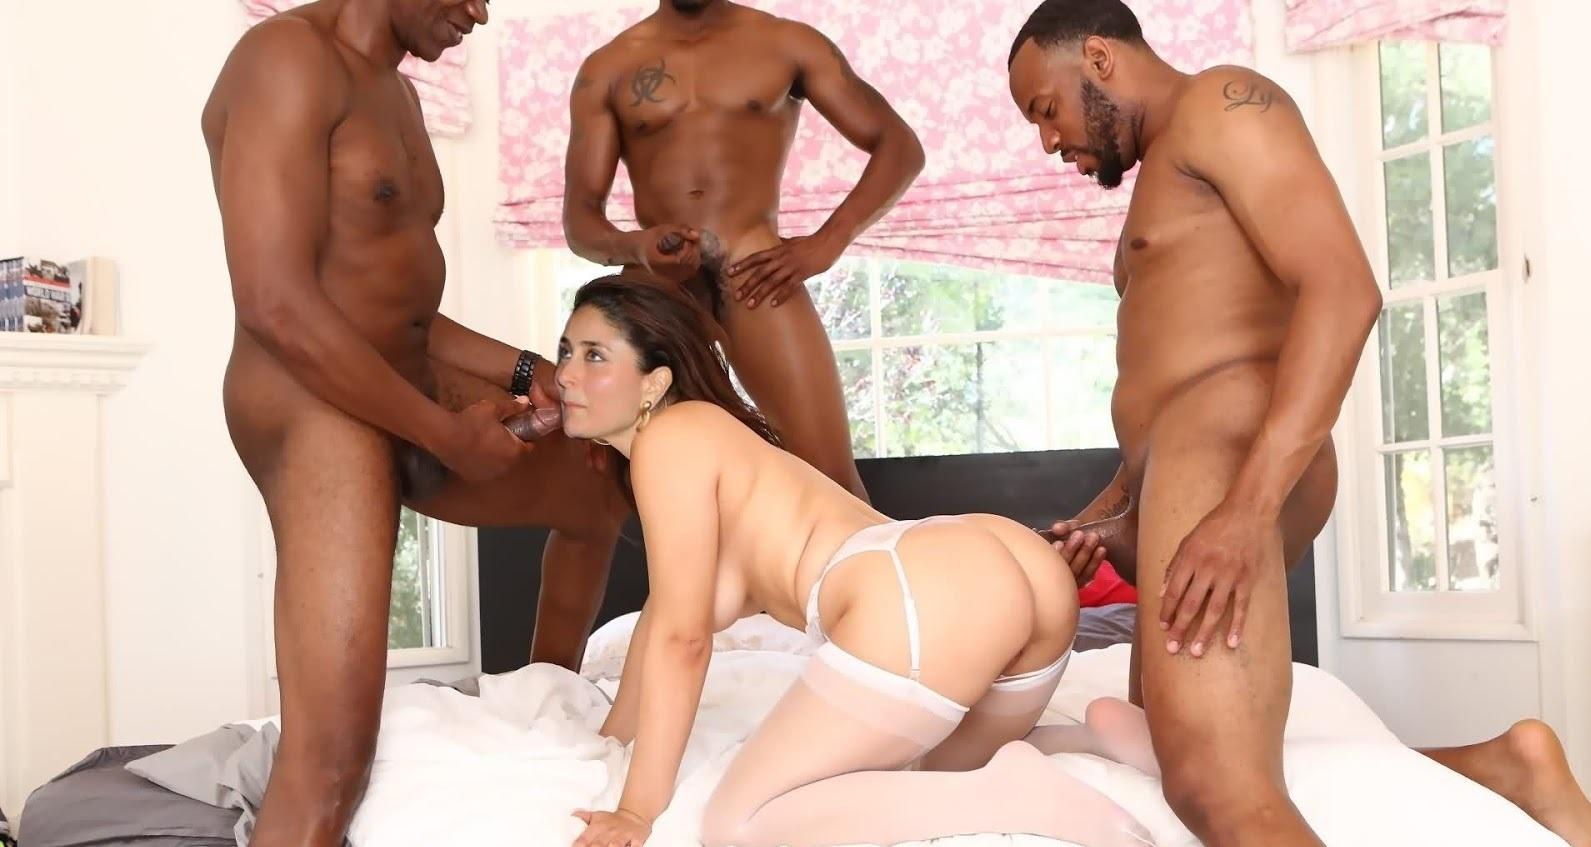 KareenaKapoorGroupSex - Kareena Kapoor Nude XXX Nangi Porn Pics